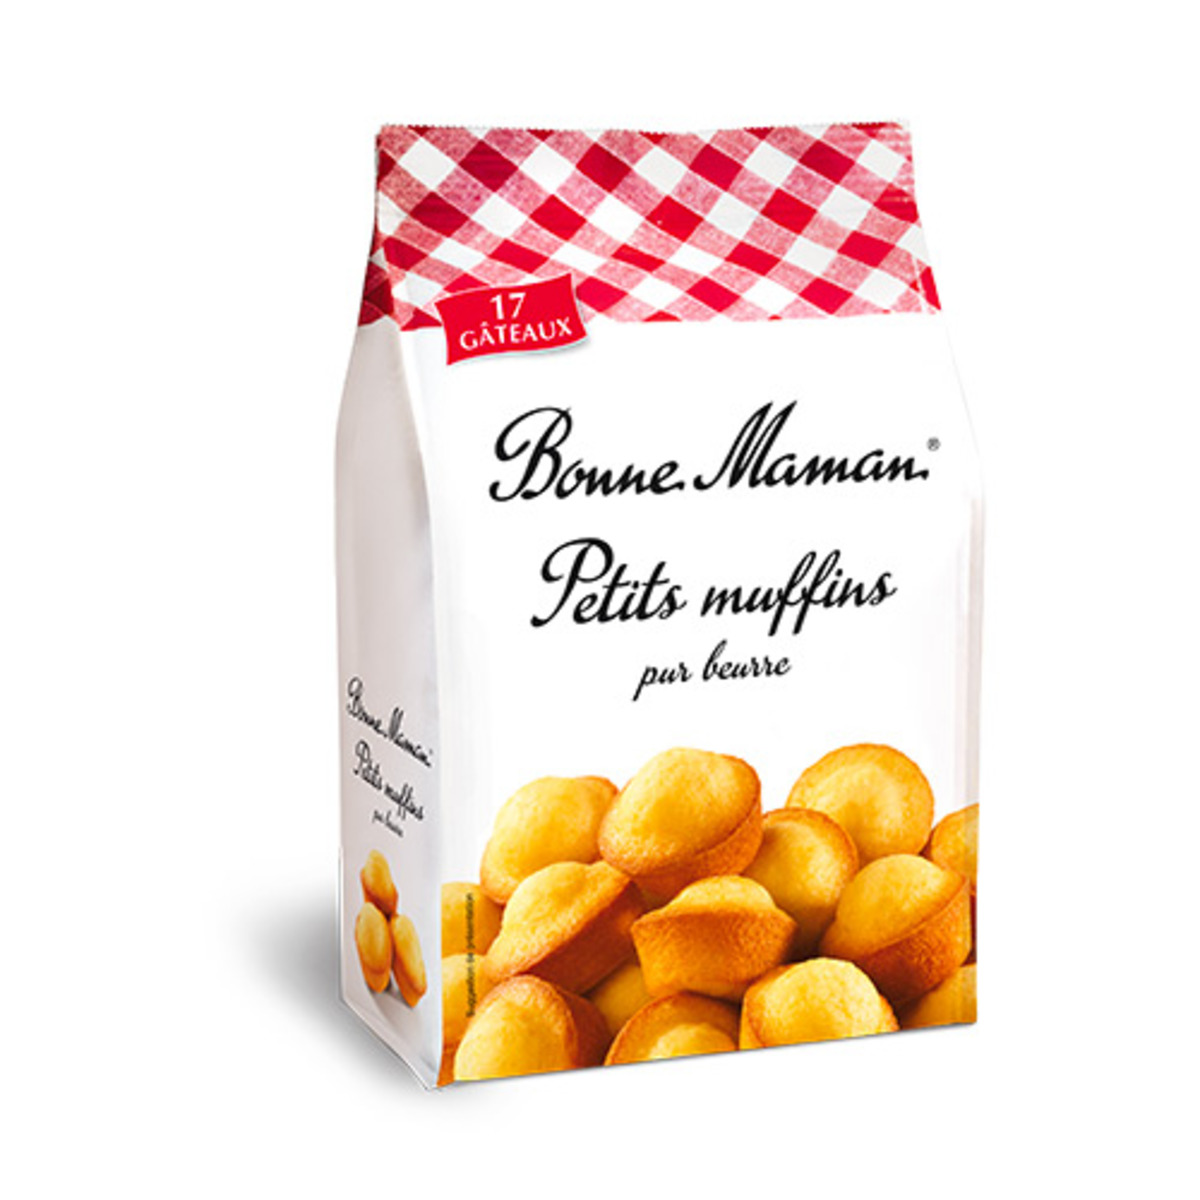 Les petits muffins nature, Bonne Maman (x 17, 235 g)